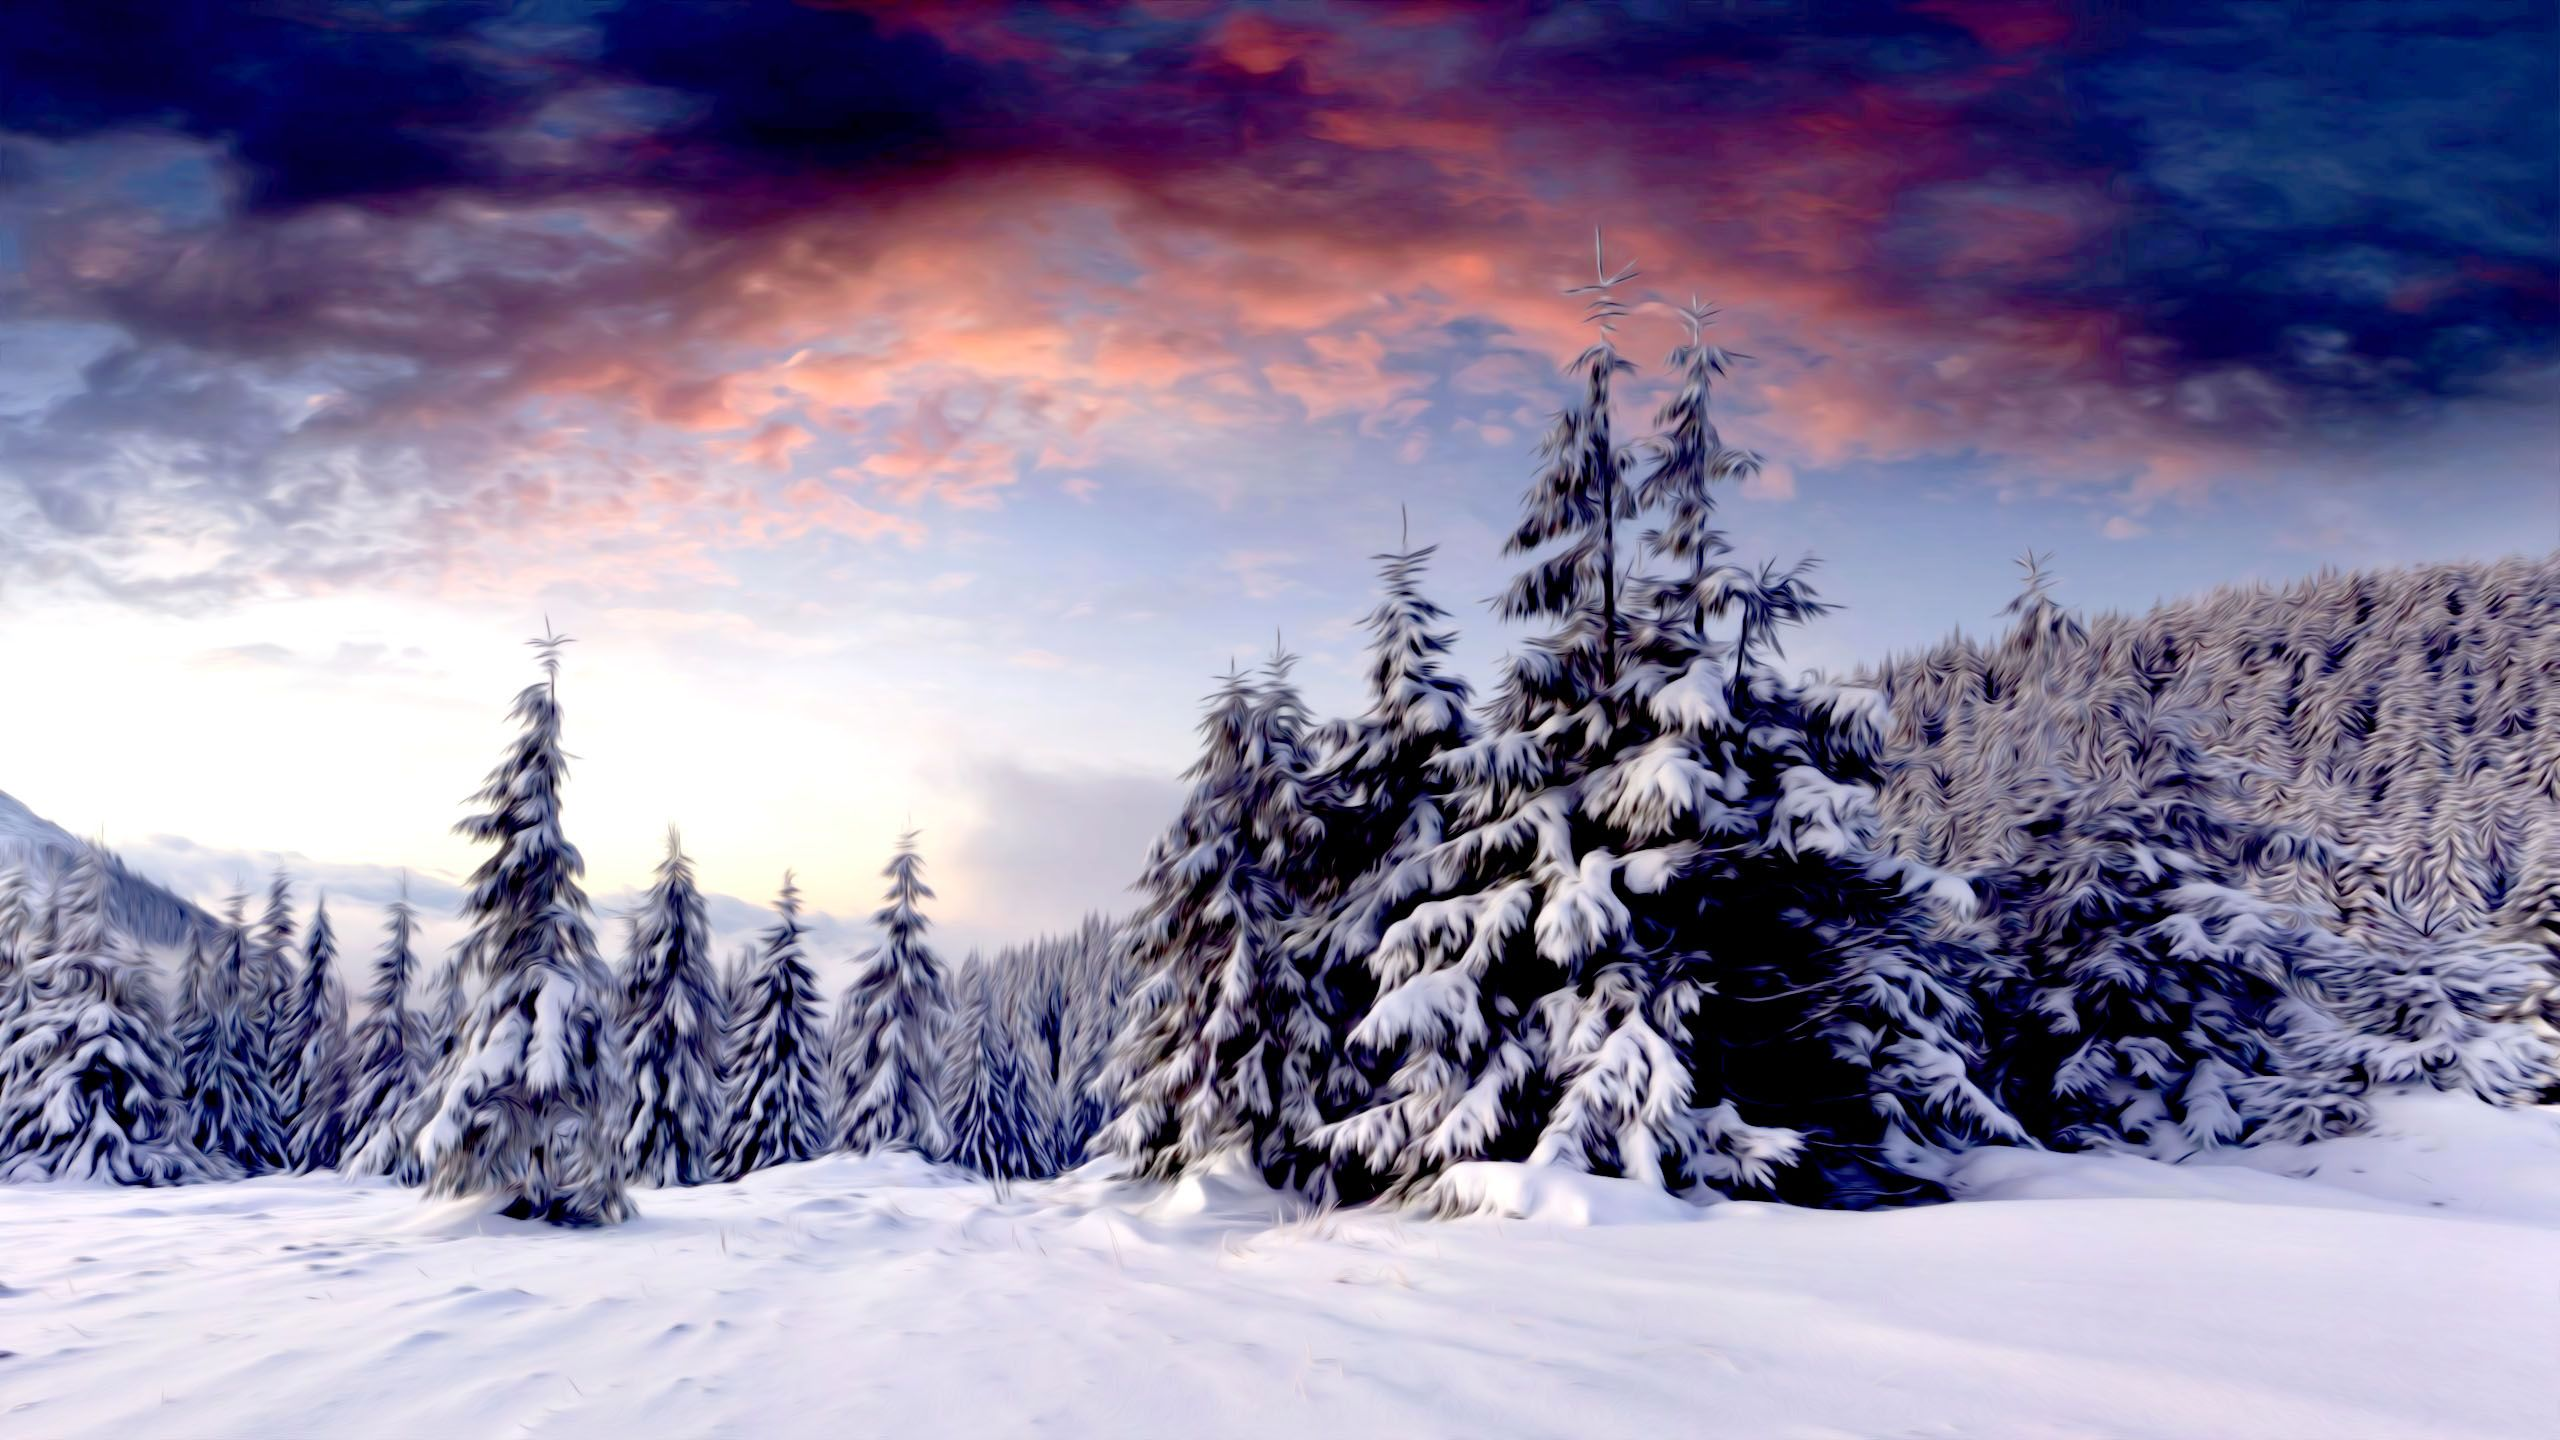 Winter Scenery Wallpapers Top Free Winter Scenery